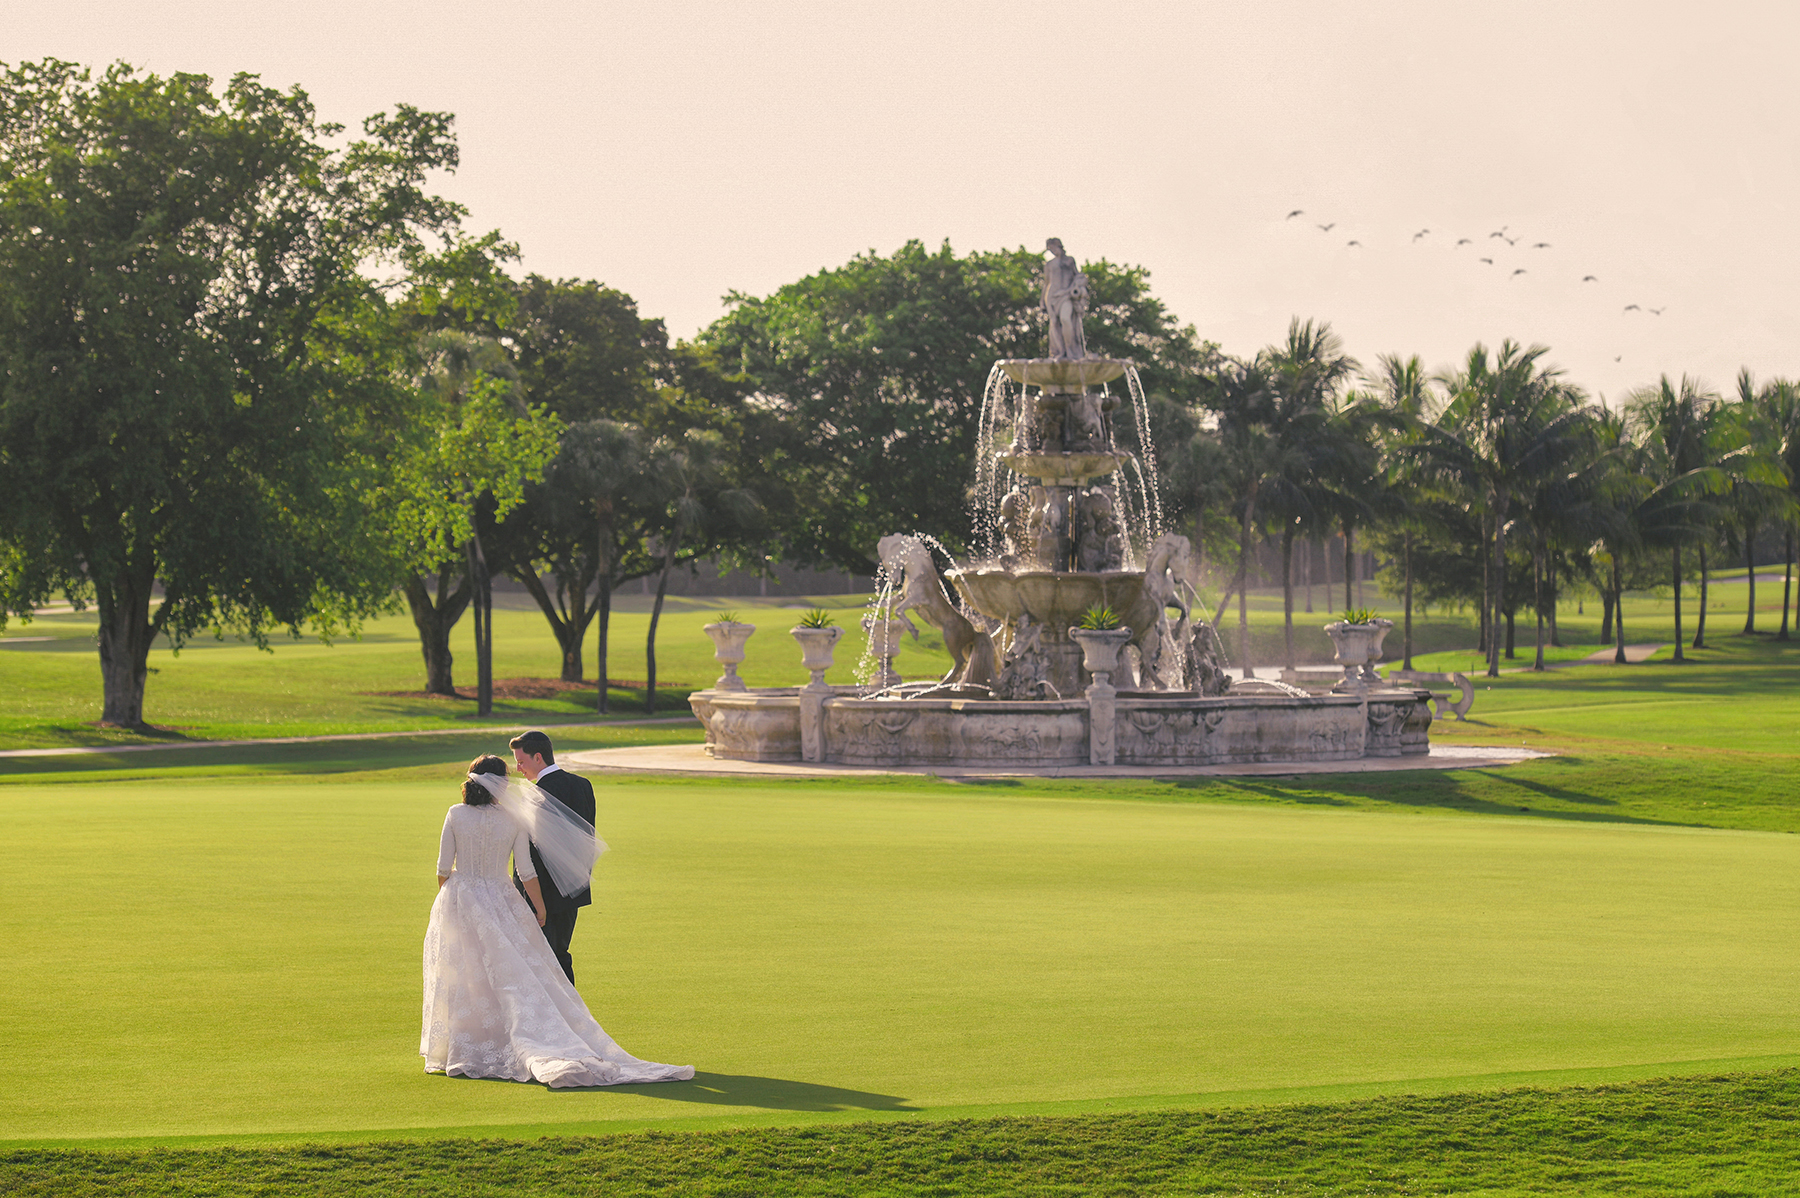 Jewish Country Club Wedding at Trump National Doral Miami by Domino Arts Photography